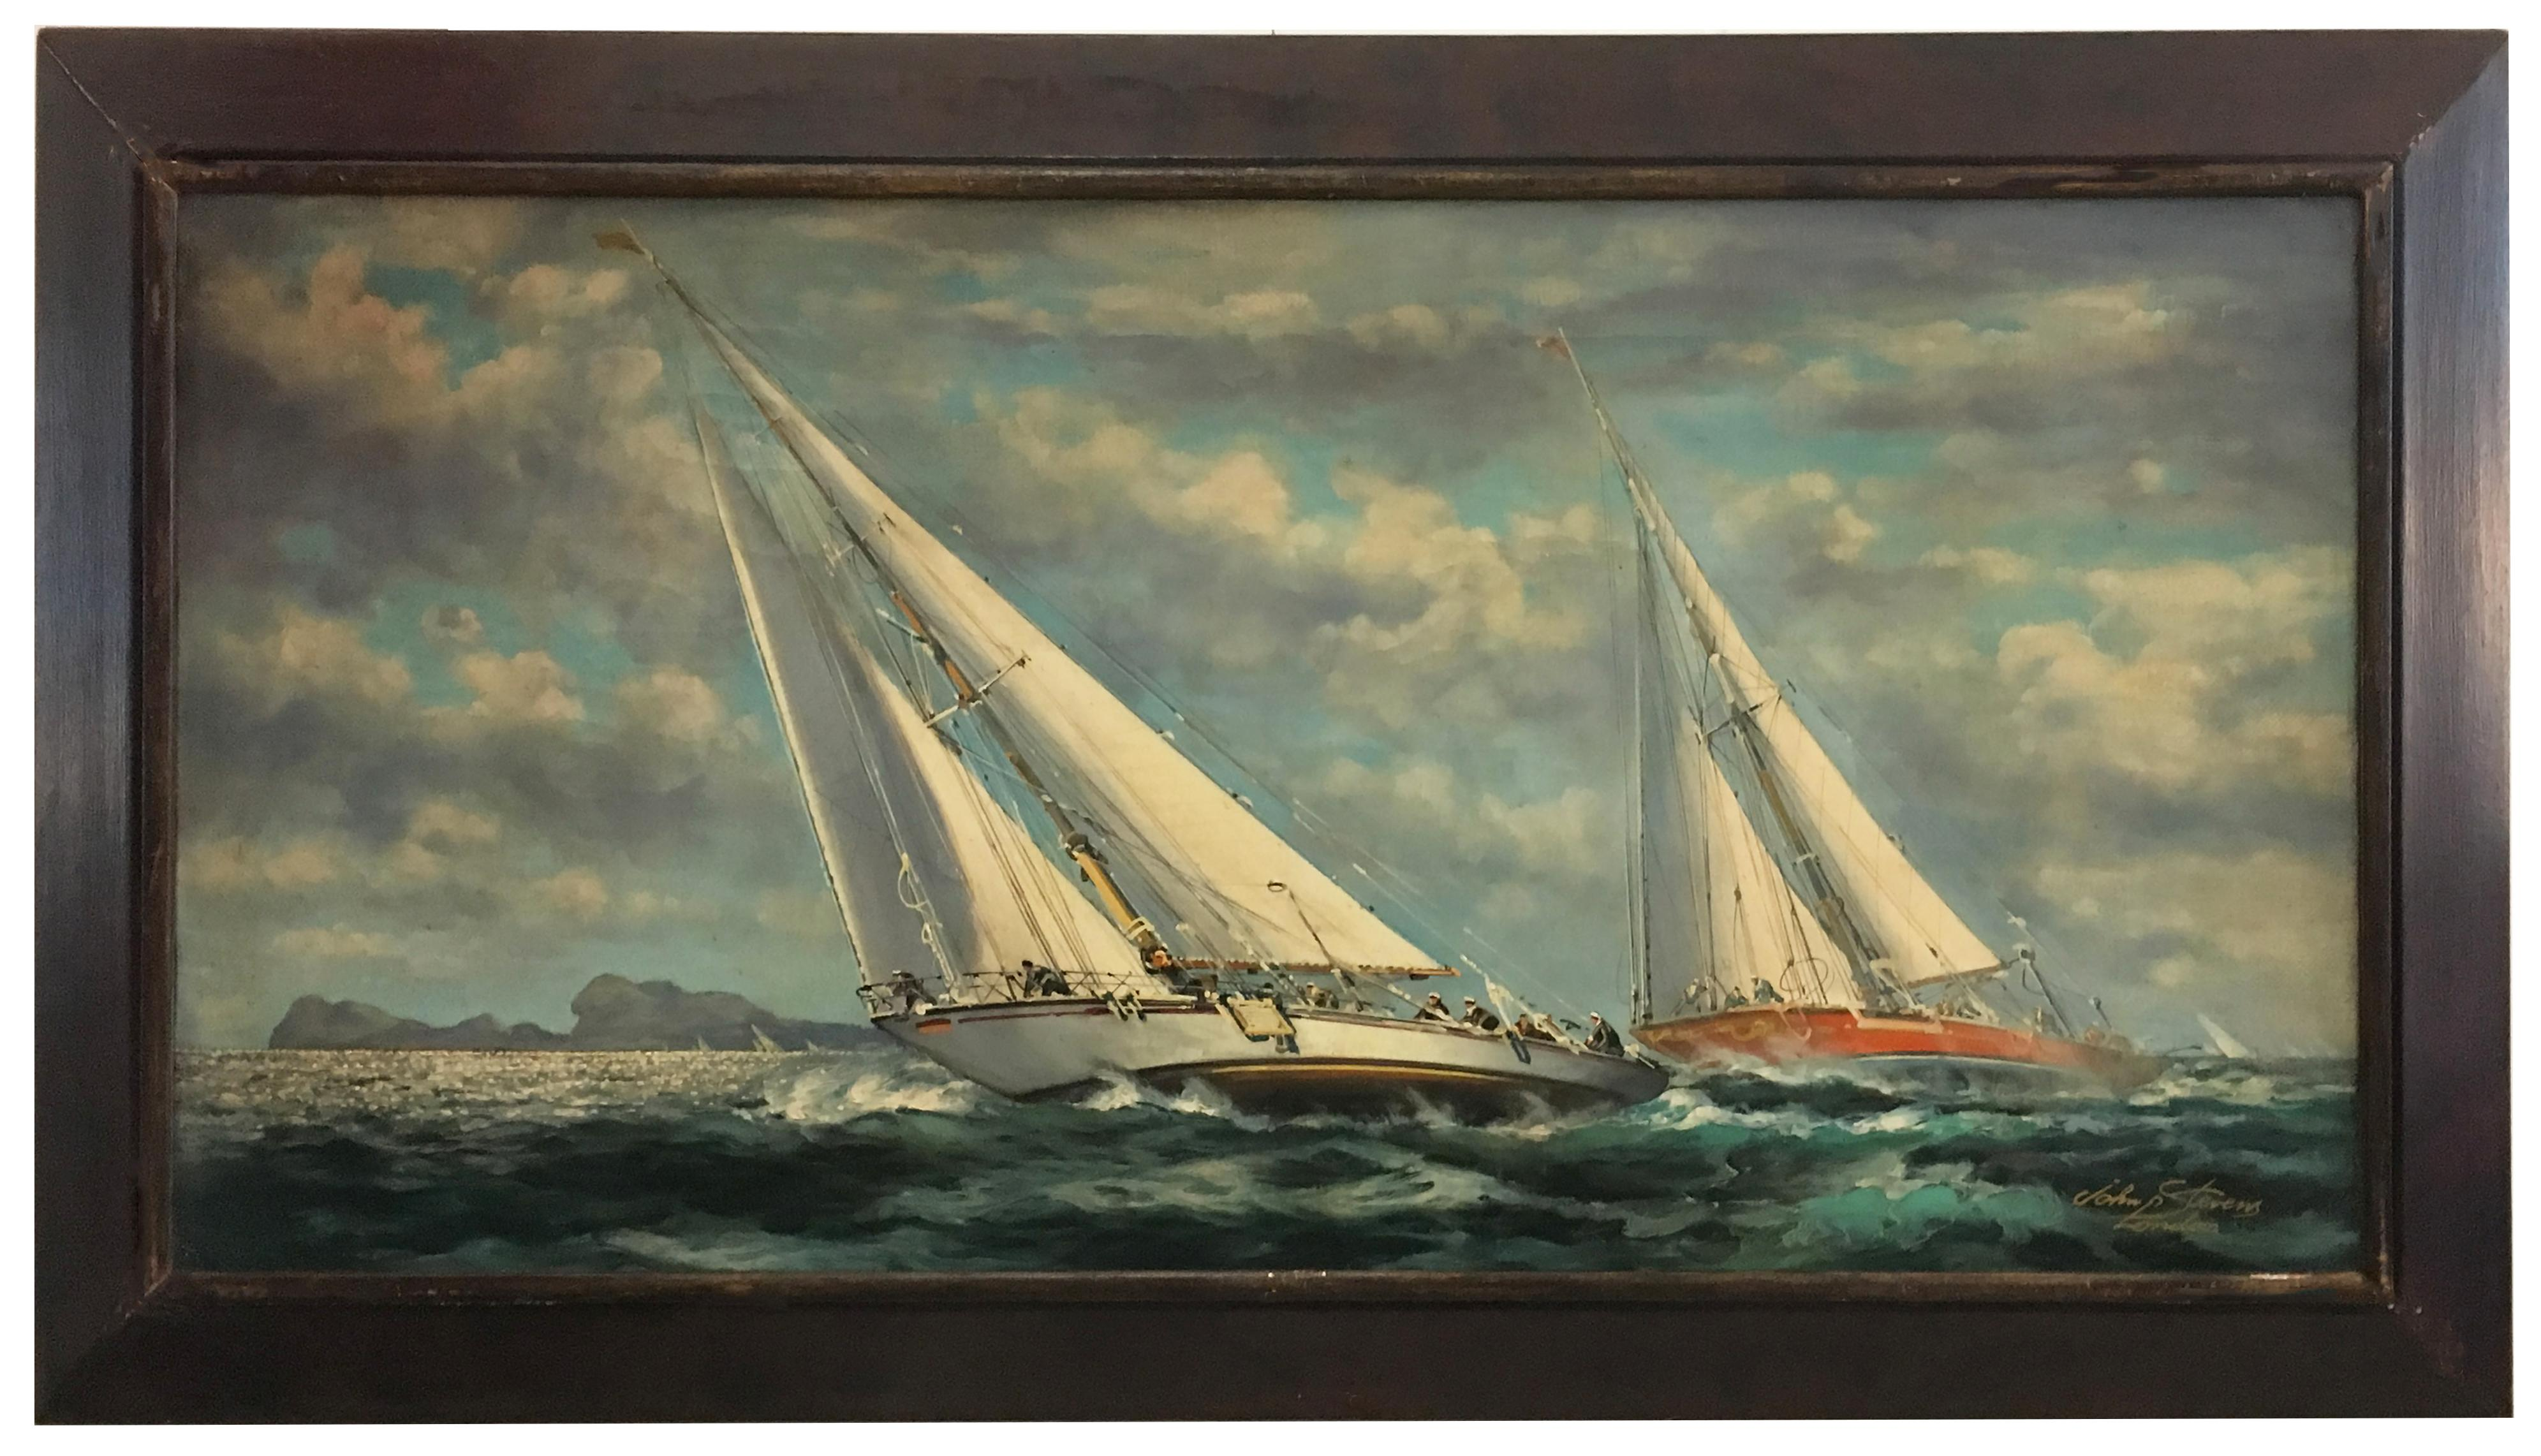 SAILING - English School -Italian Sailing Boat Oil on Canvas Painting,